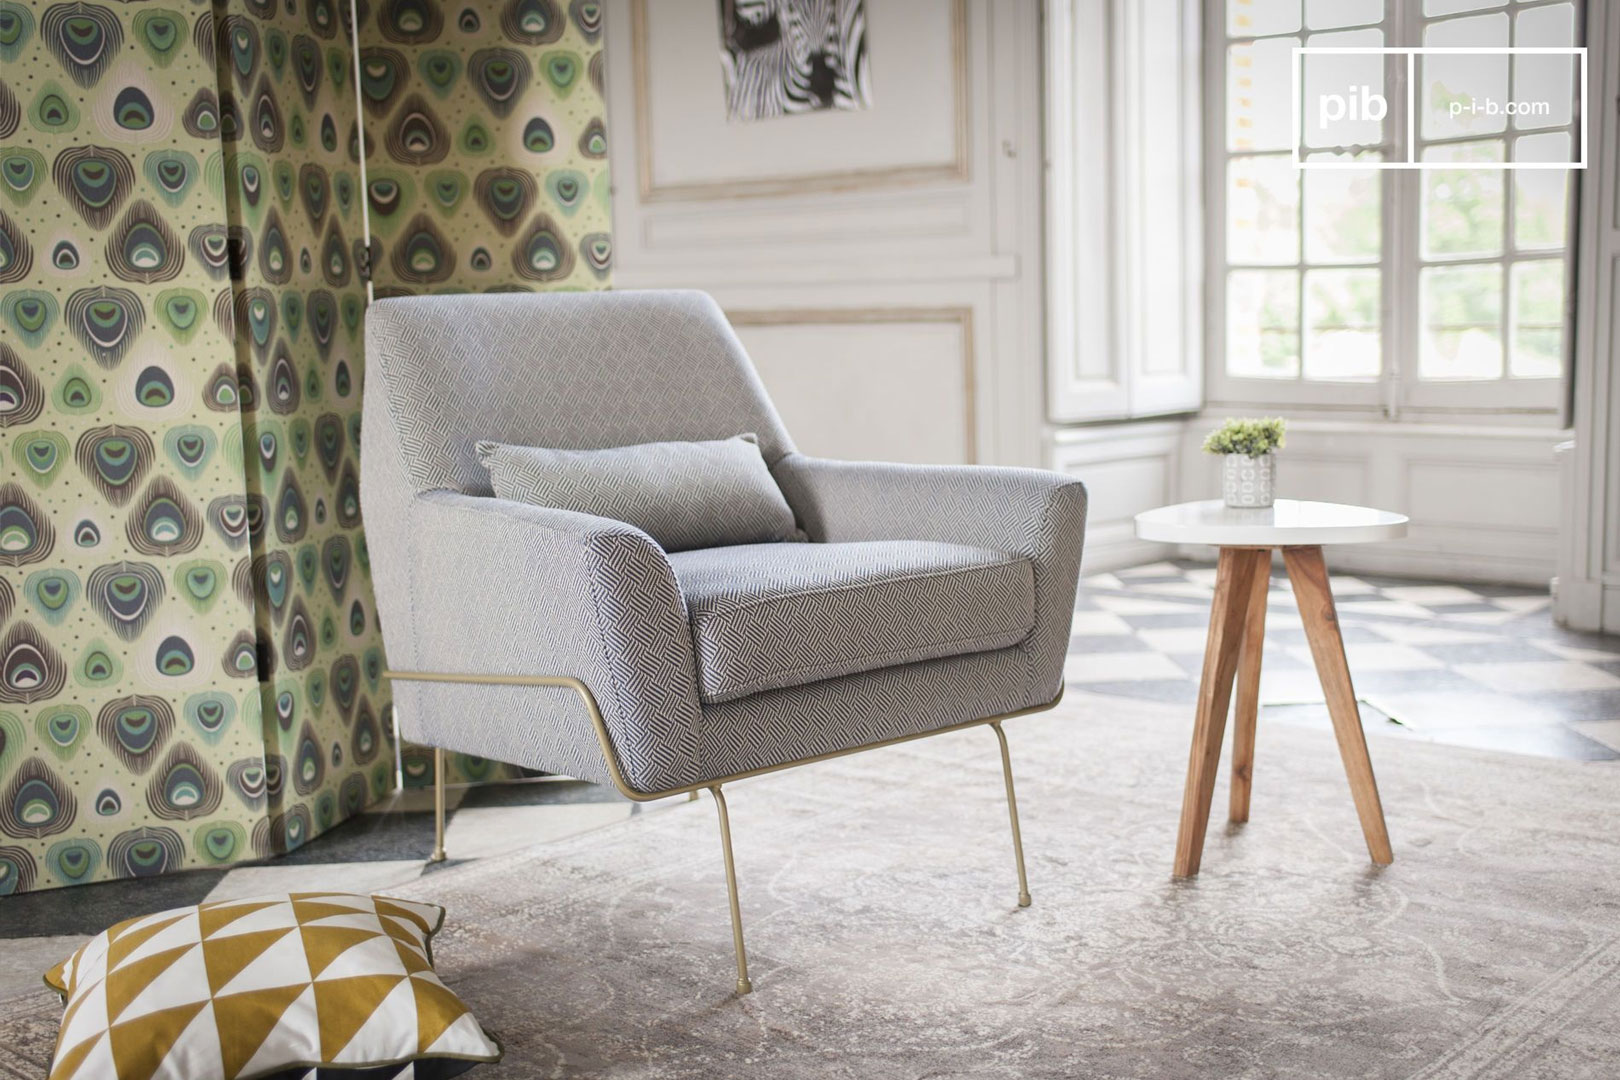 Retro-Sessel mit 60er Jahre-Muster